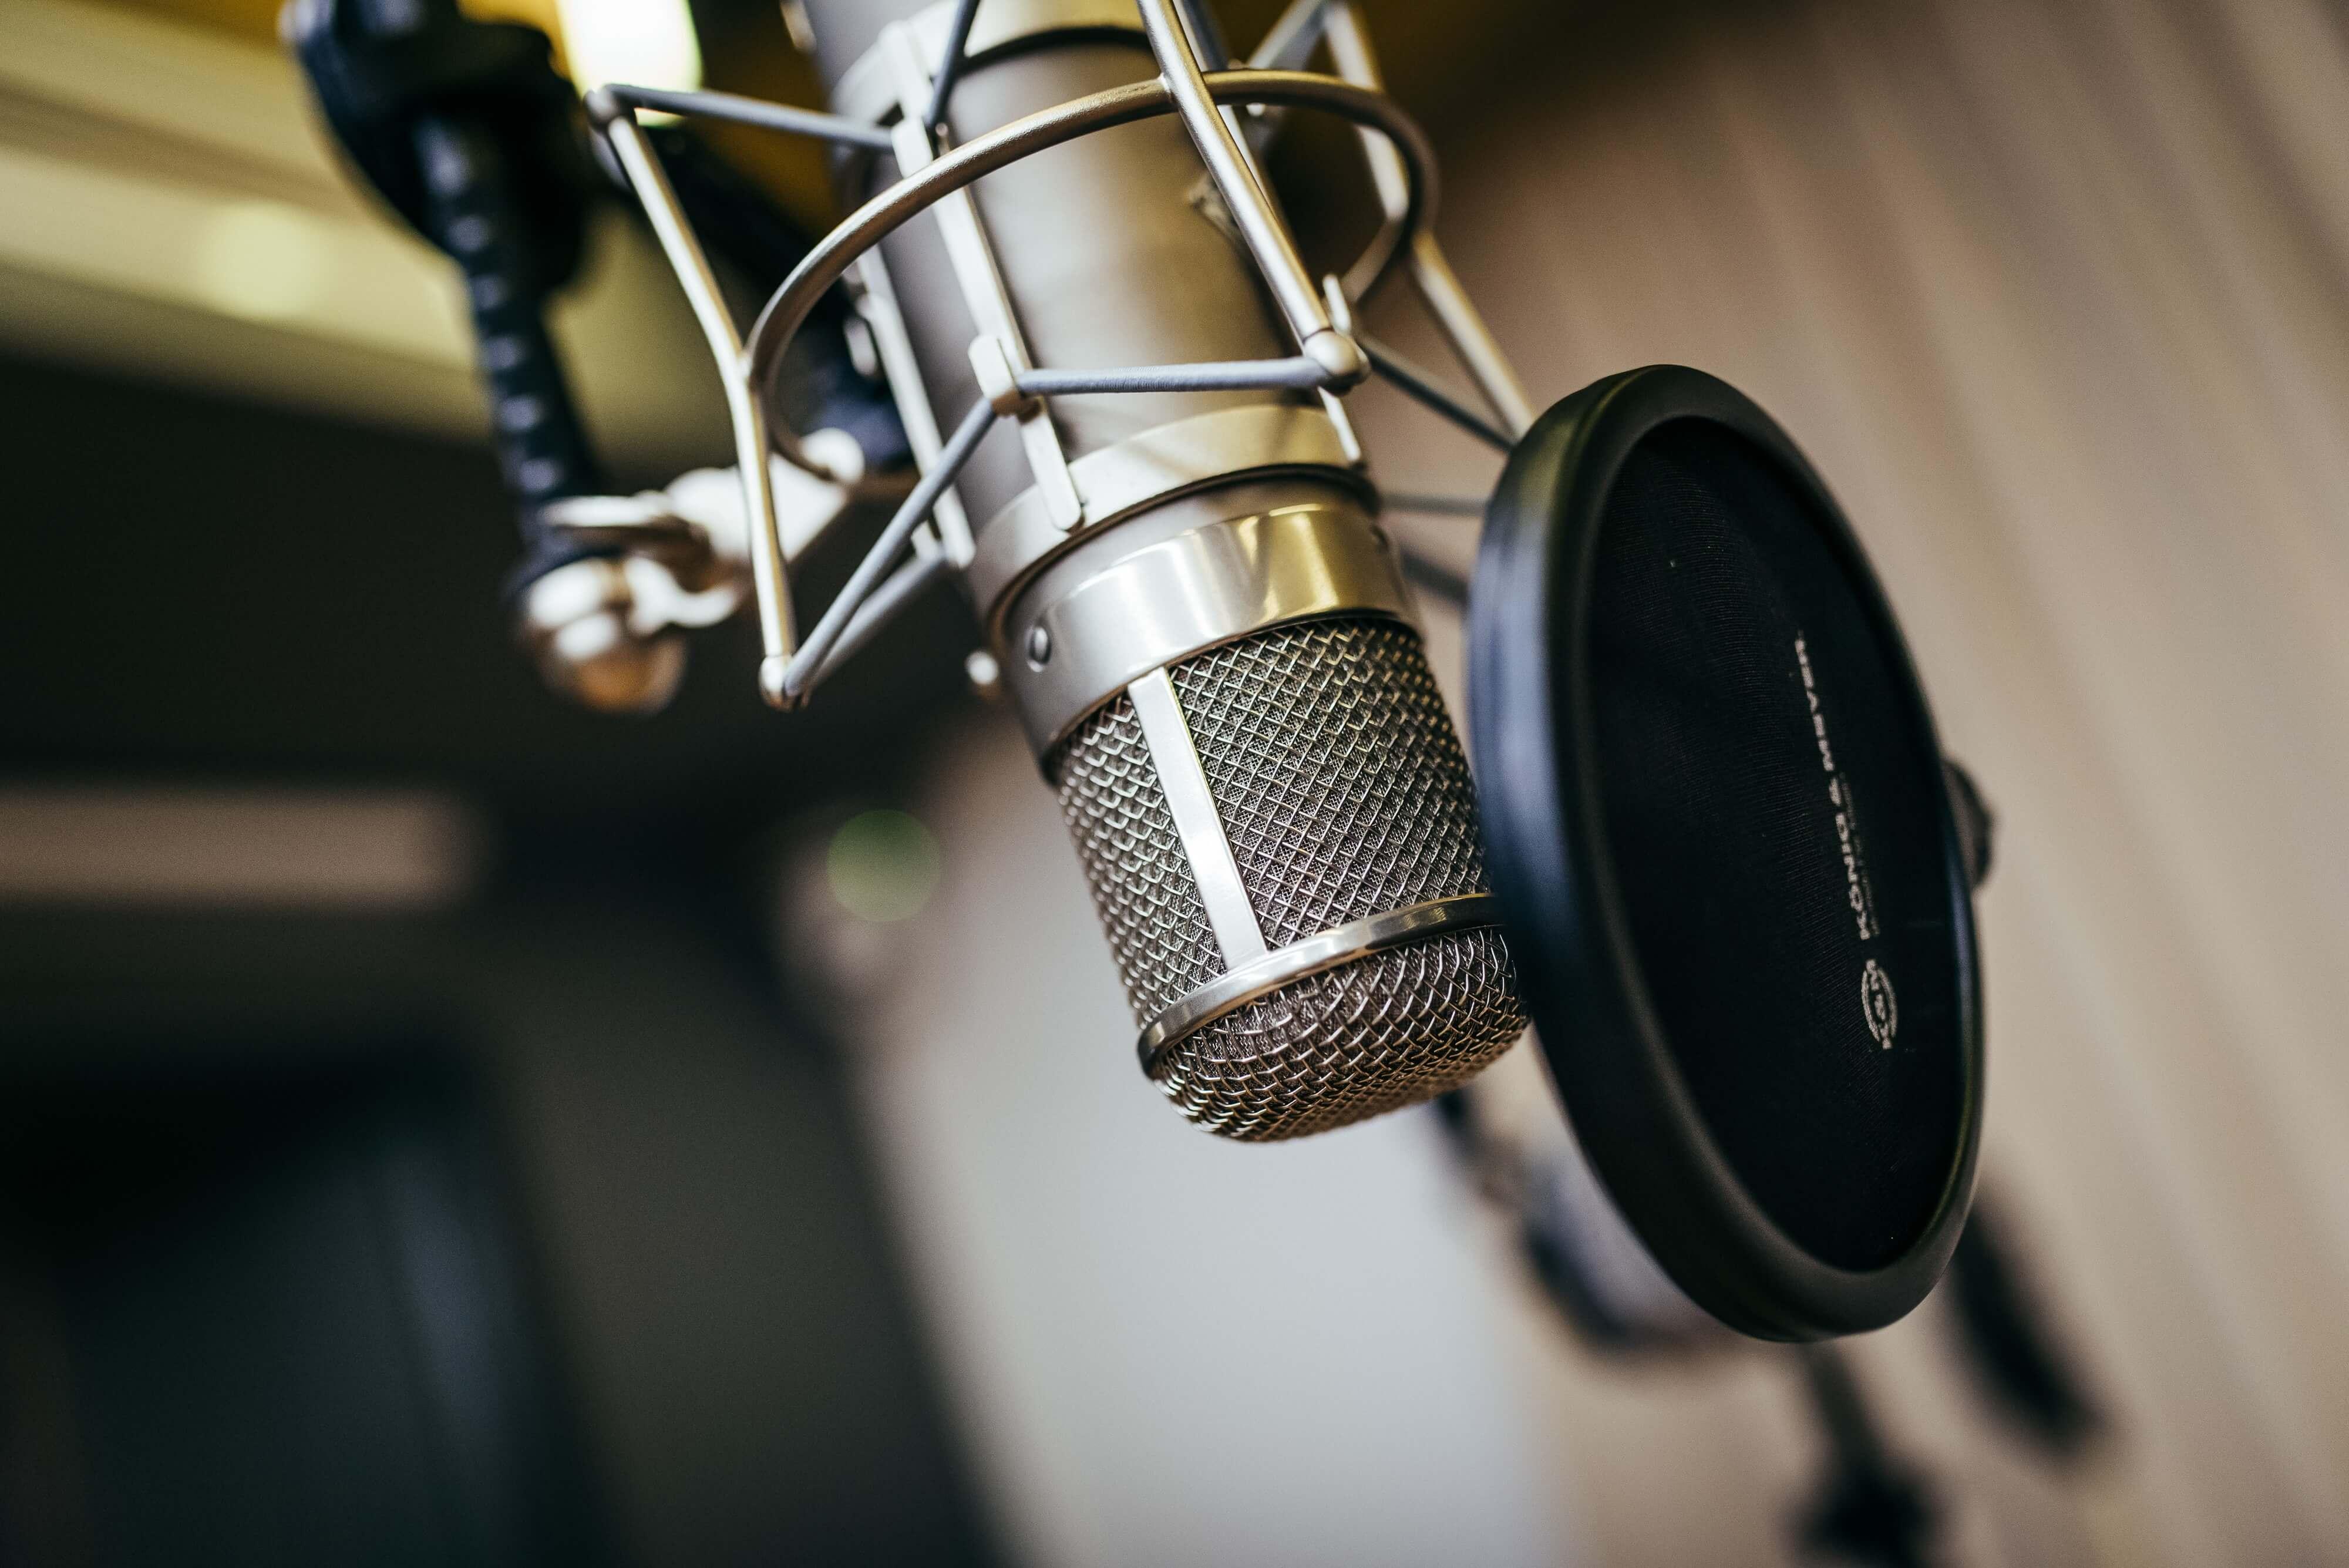 productor musical barcelona microfono cantante profesional